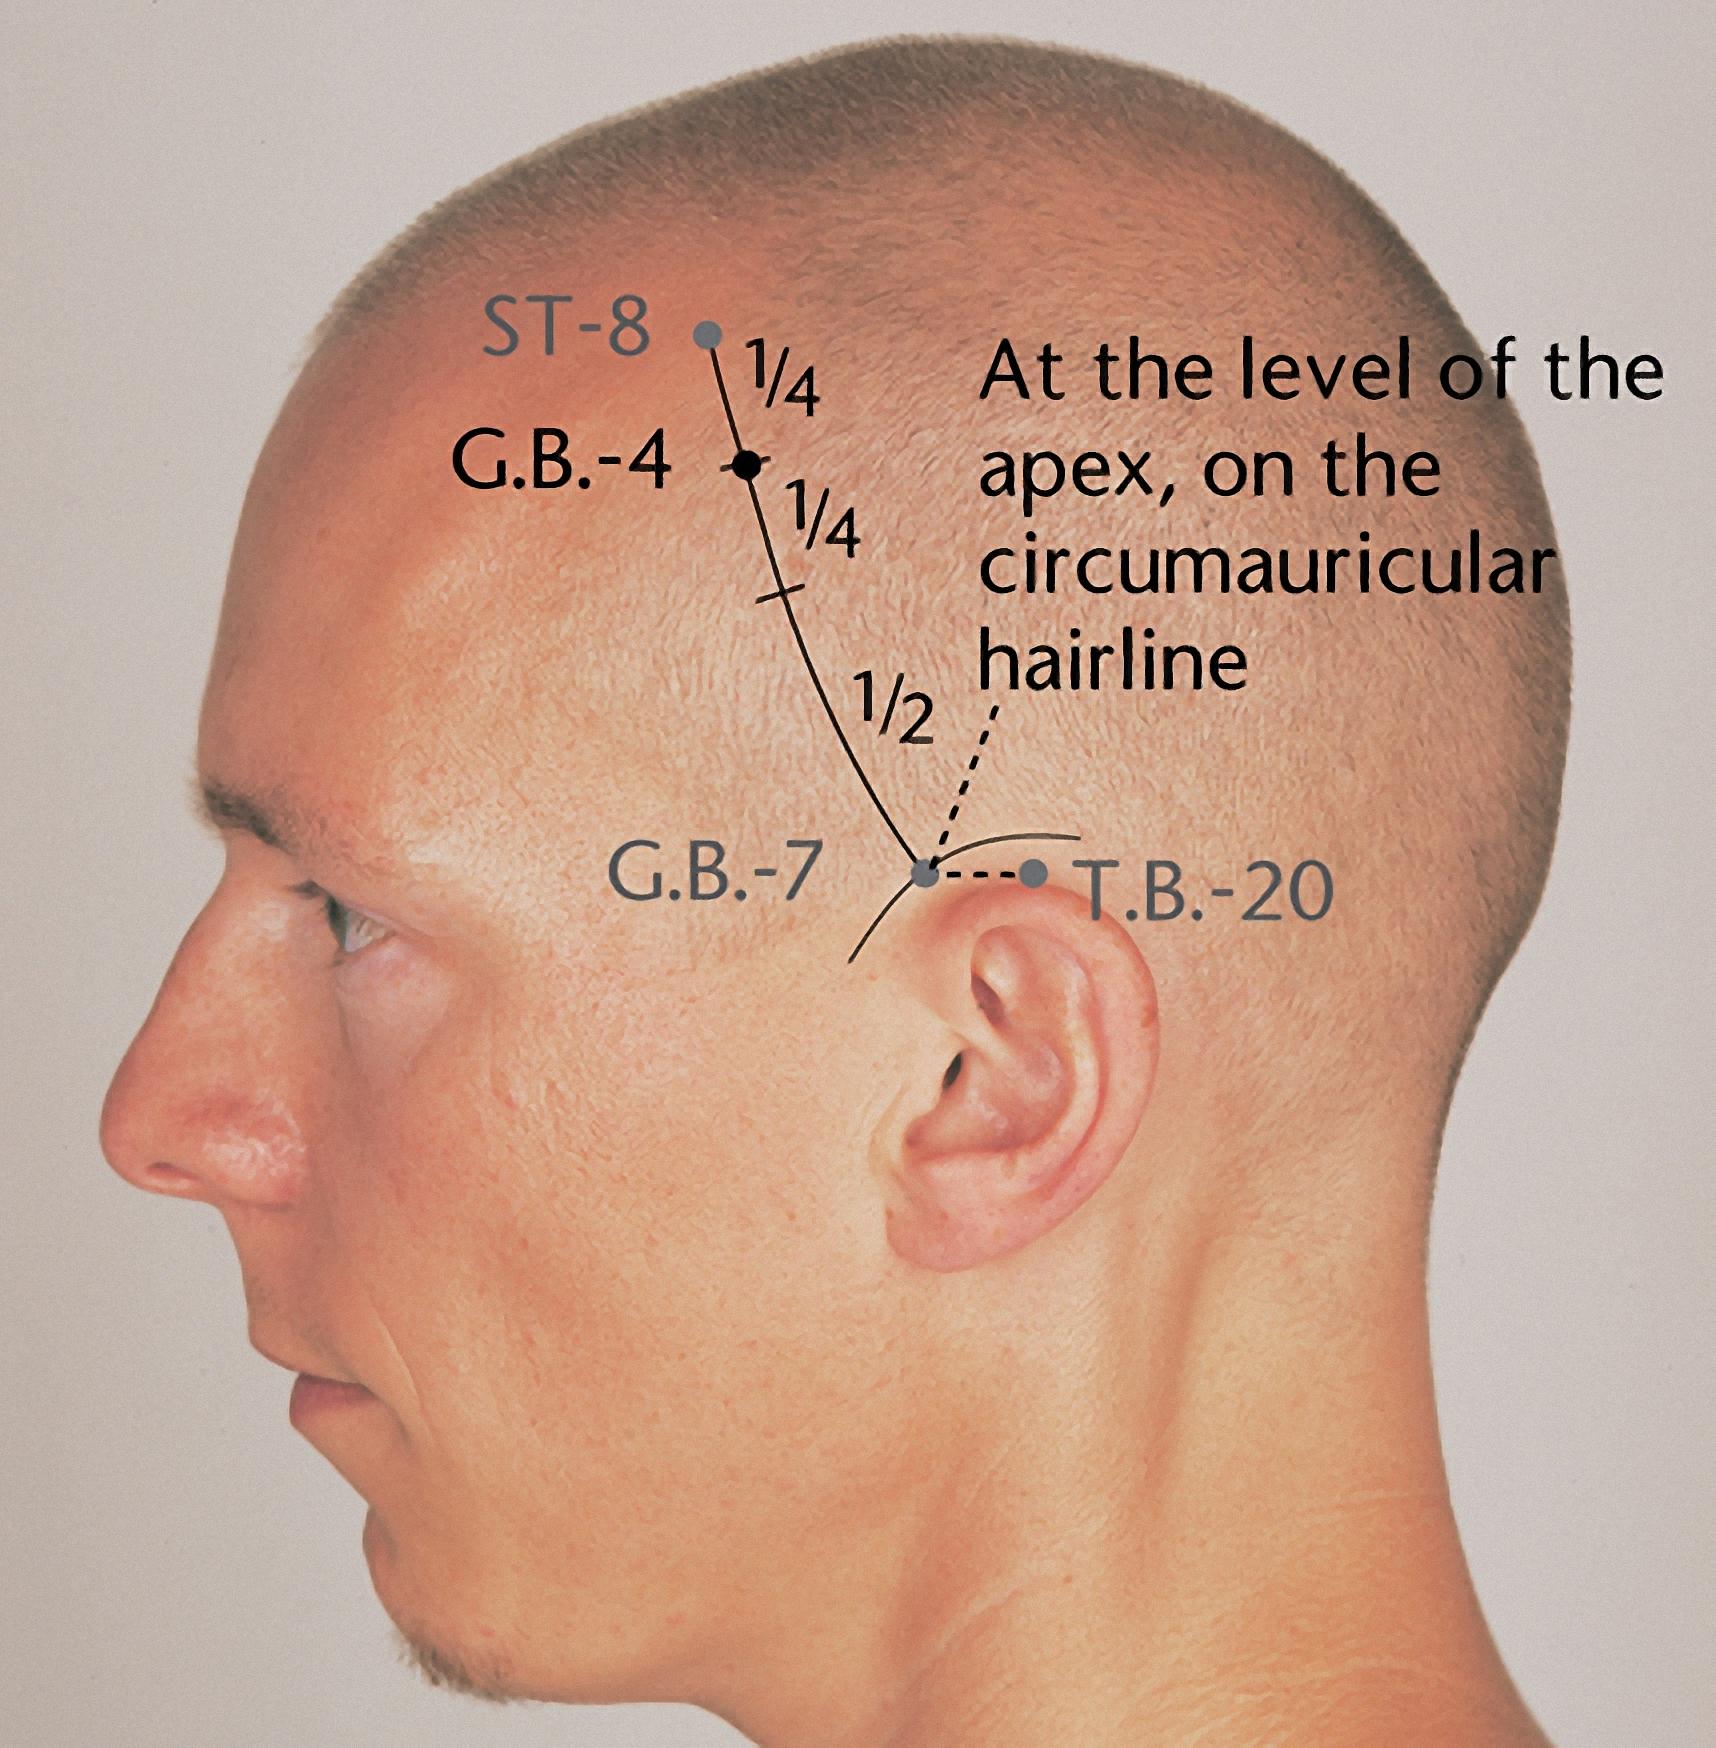 Claudia Focks. Atlas of Acupuncture. Churchill Livingstone, 2008.